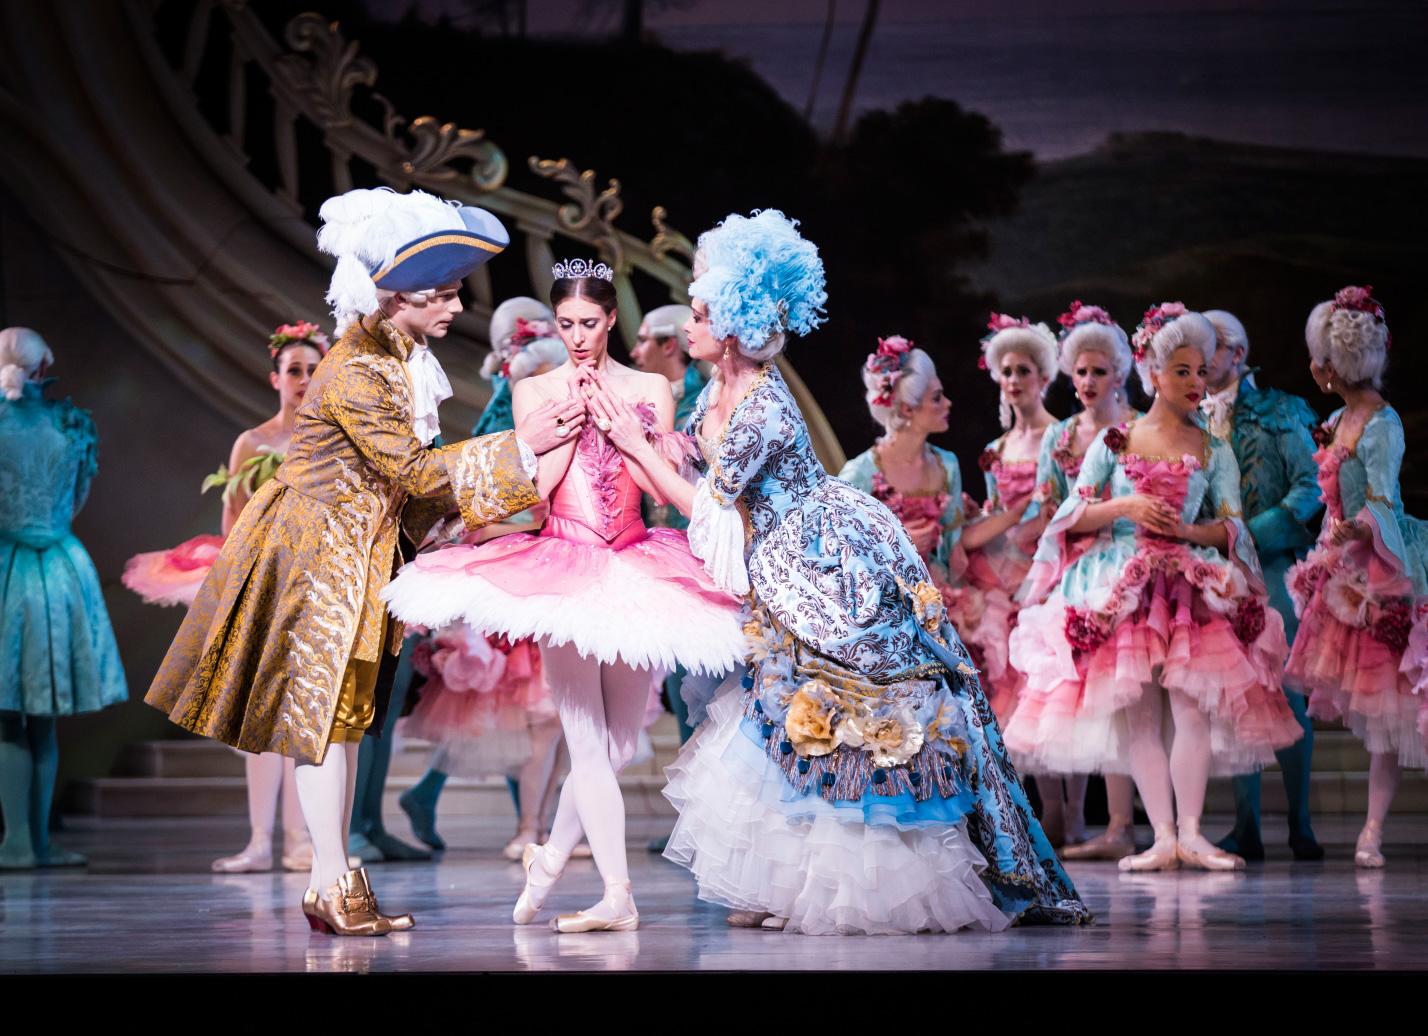 The Sleeping Beauty 2015 The Australian Ballet Royal Family & The Australian Ballet: The Sleeping Beauty review u2013 Simon Parris ...